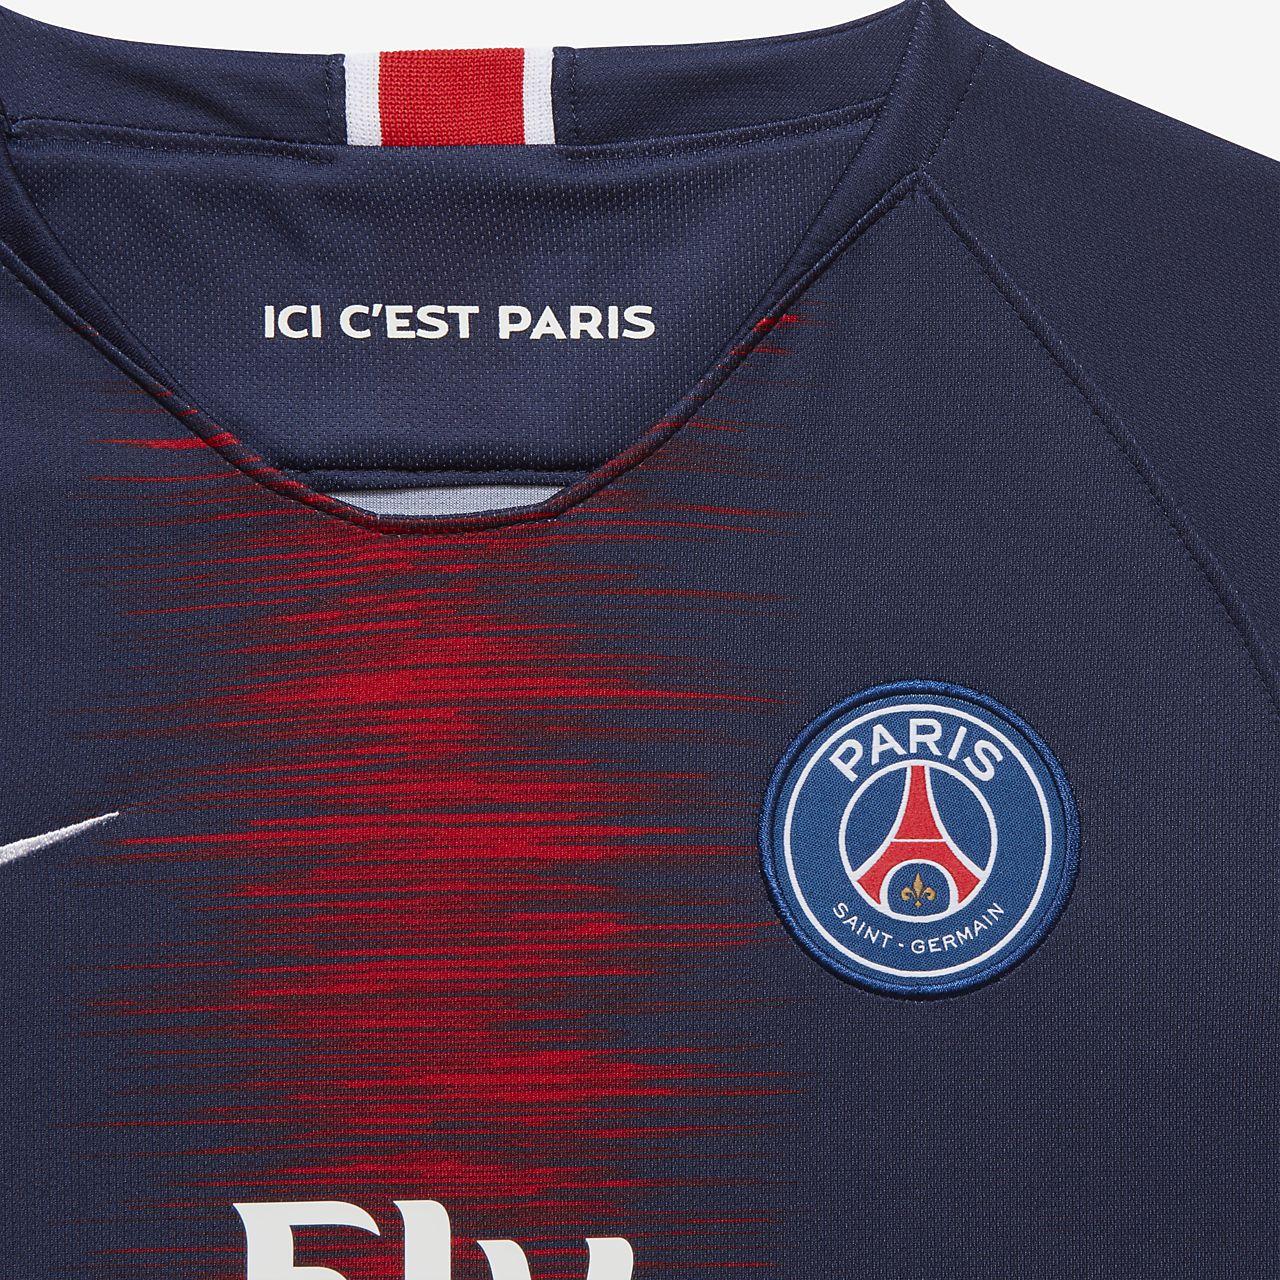 121be70a ... 2018/19 Paris Saint-Germain Stadium Home Older Kids' Football Shirt